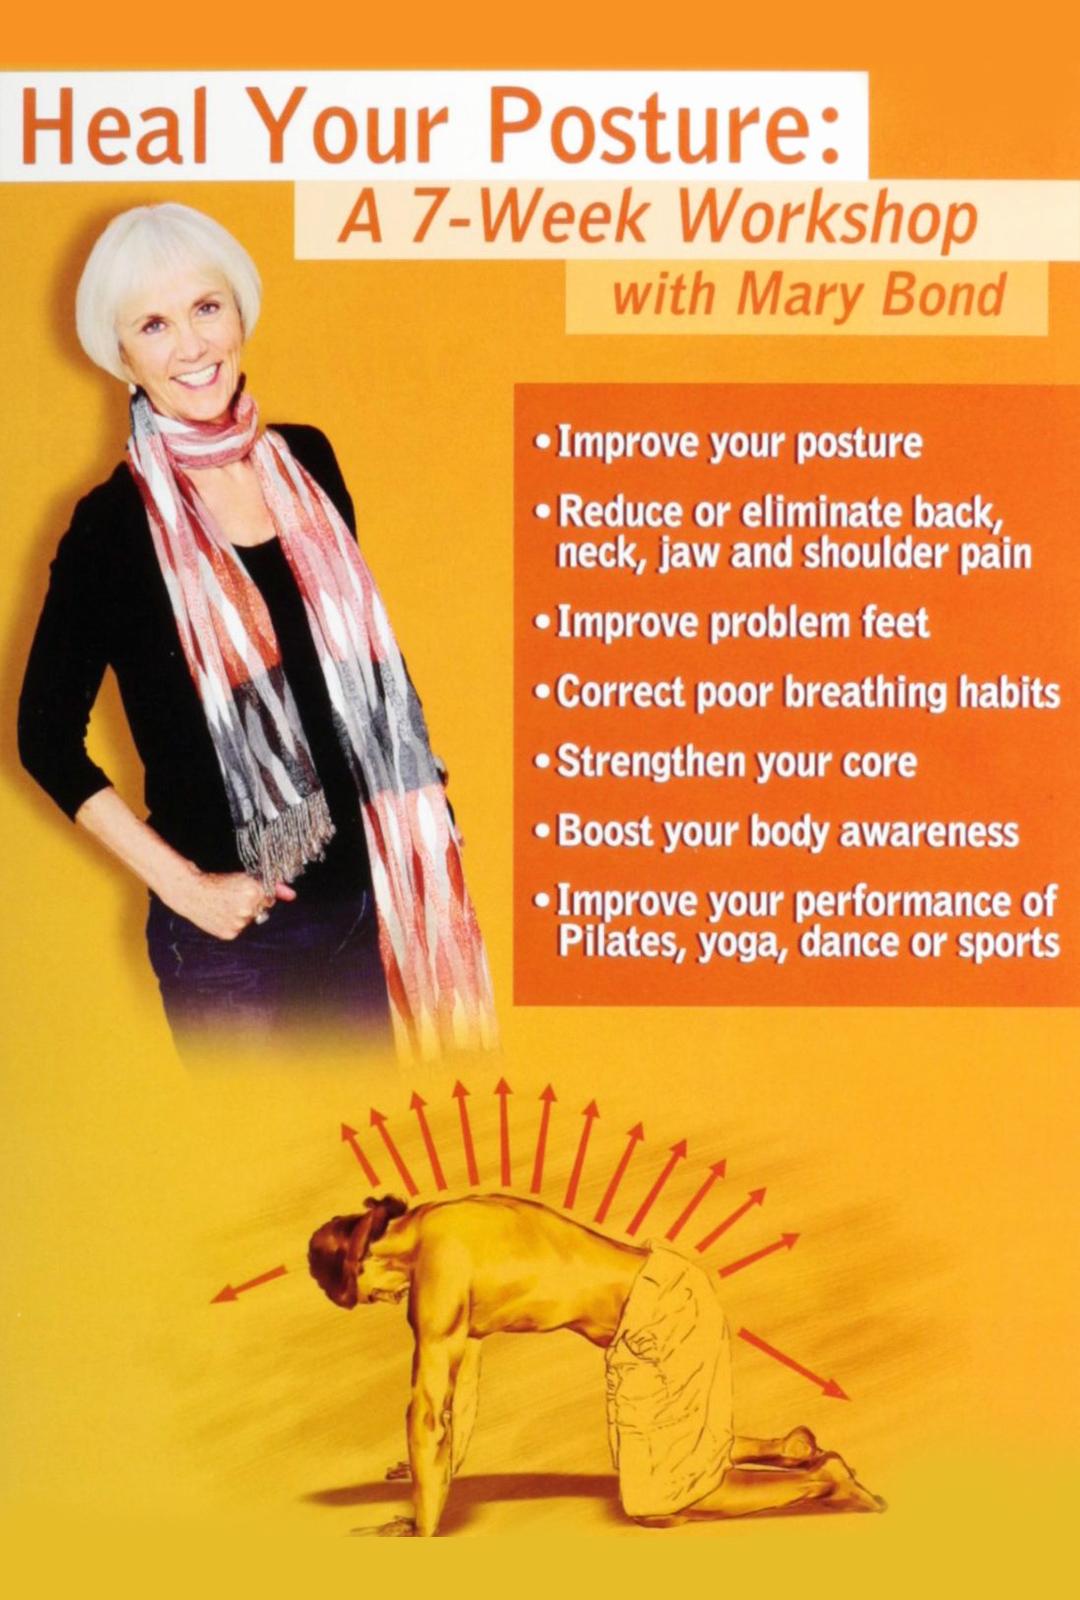 Heal Your Posture: A 7-Week Workshop